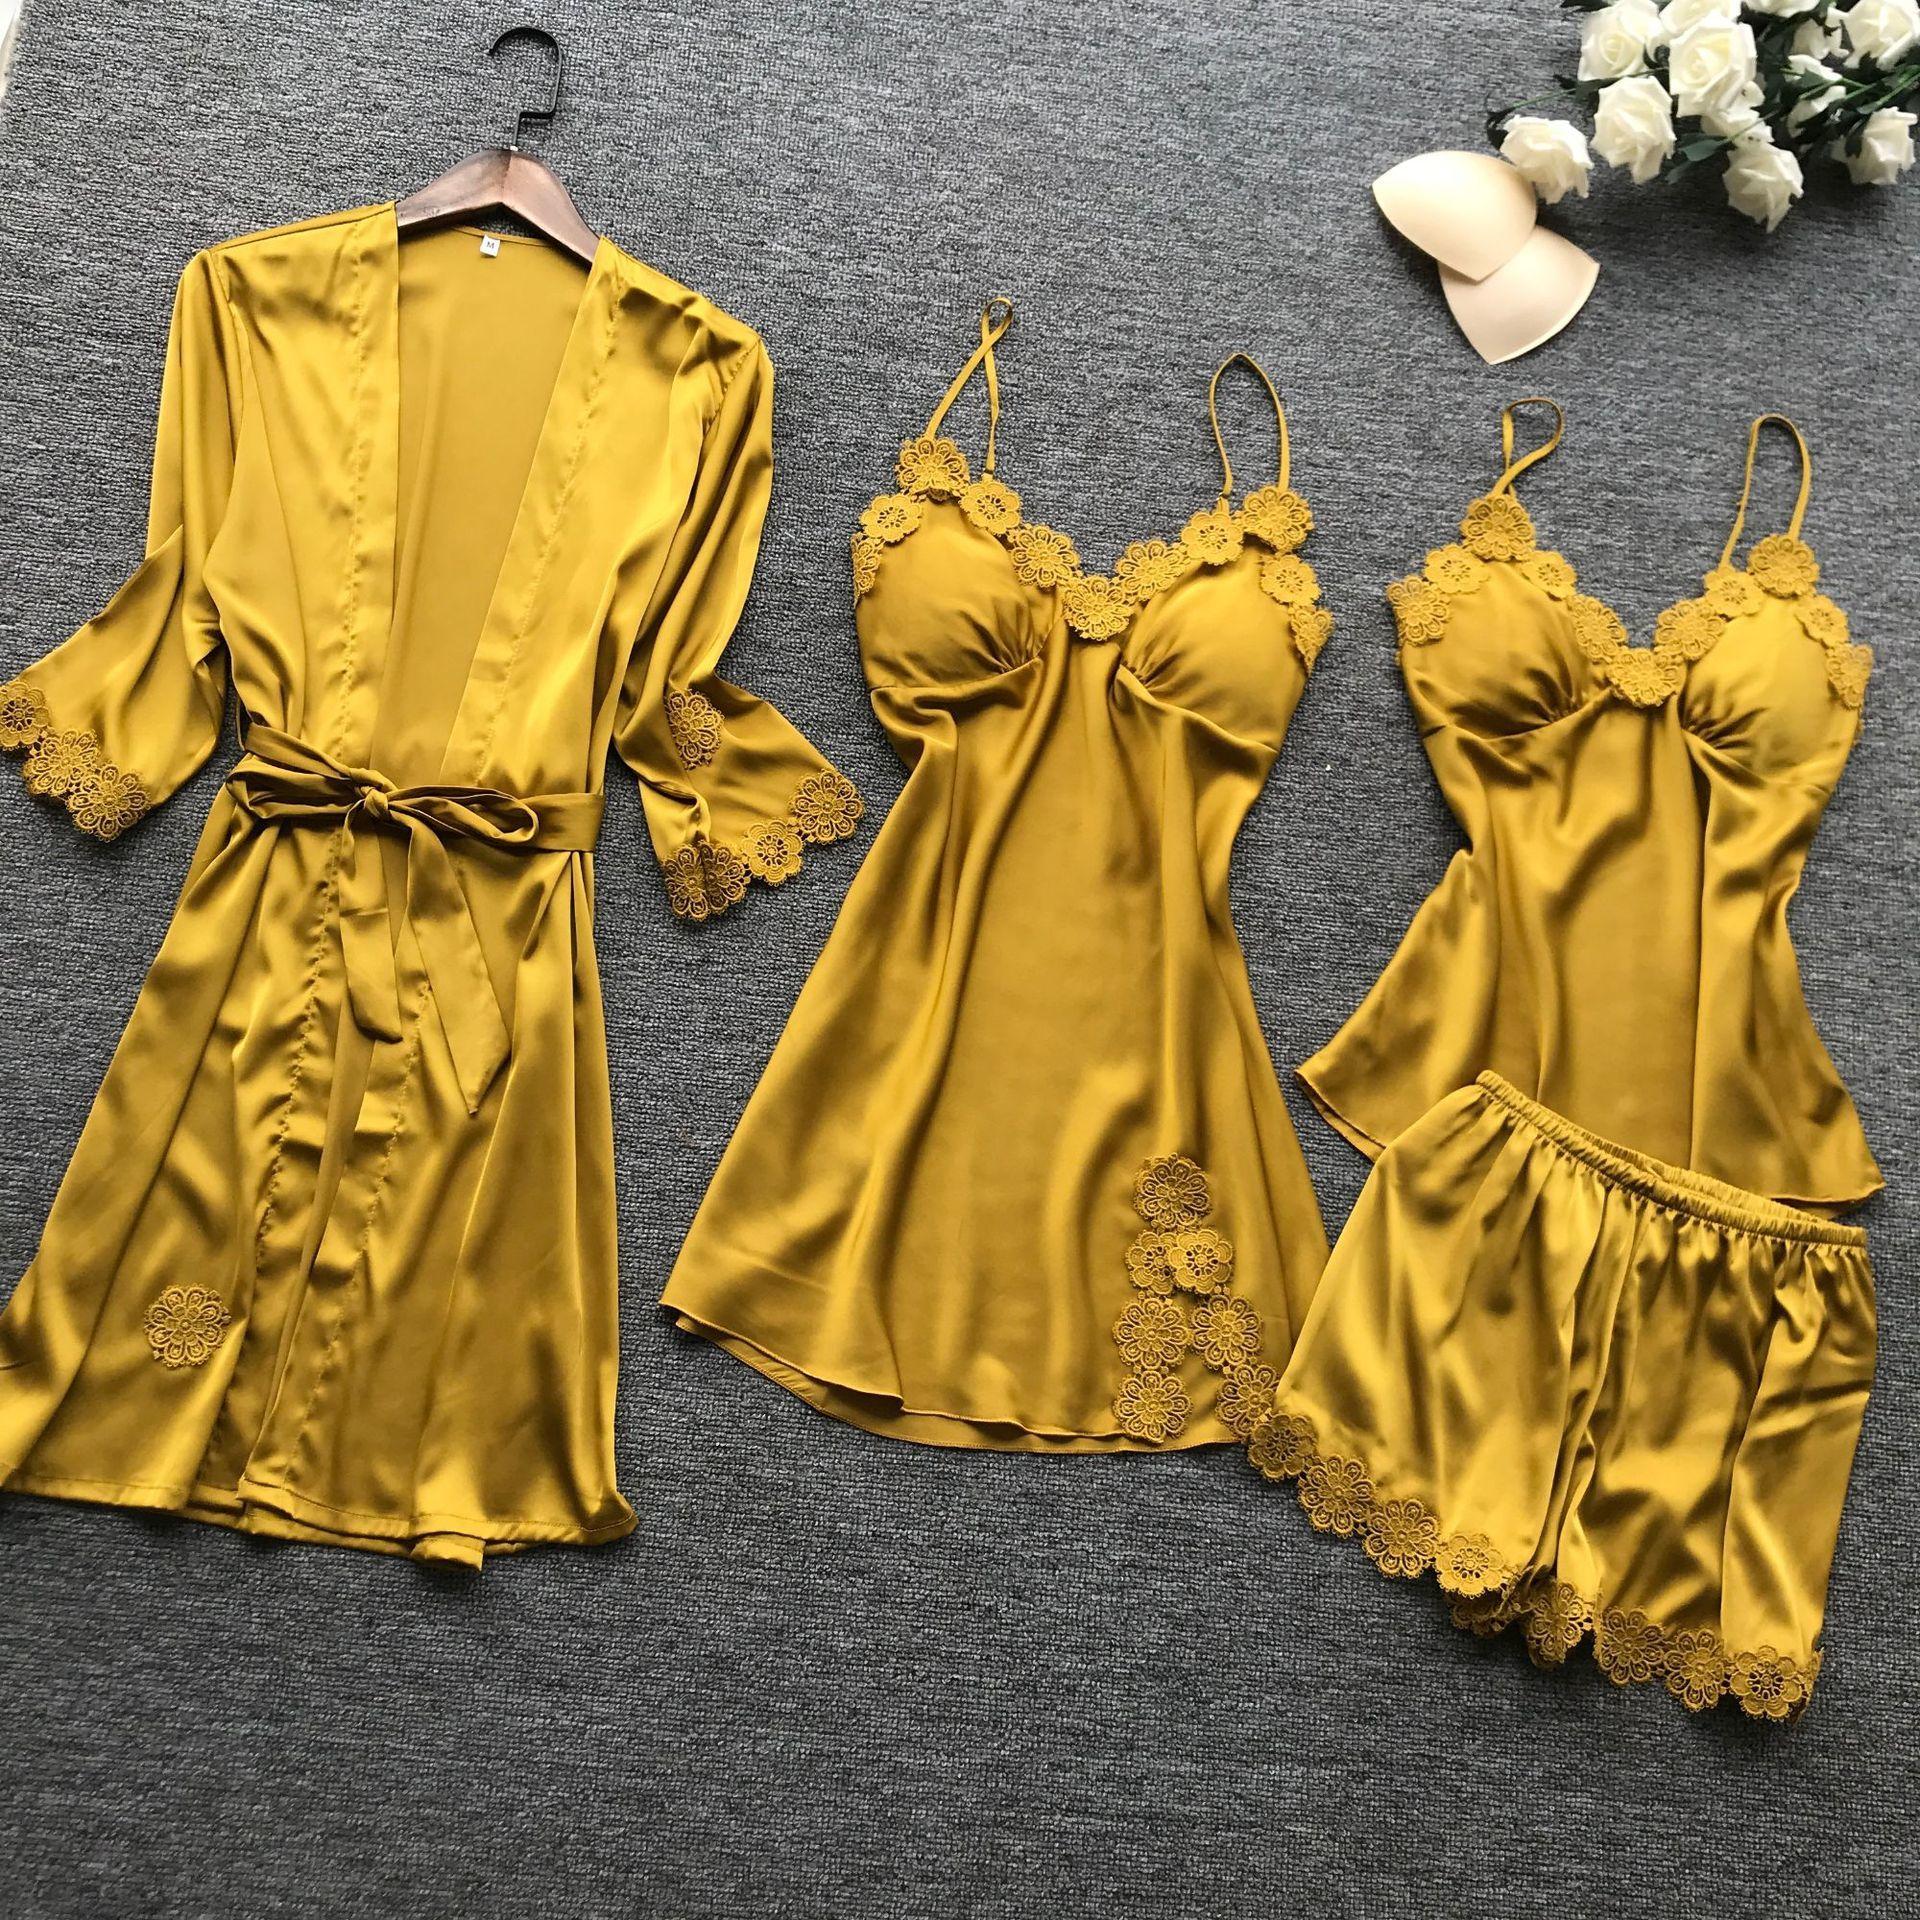 Summer New 4 Pcs Set Women Pyjama Satin High Quality Lace Sexy Sleepwear With Chest Pad Pajamas